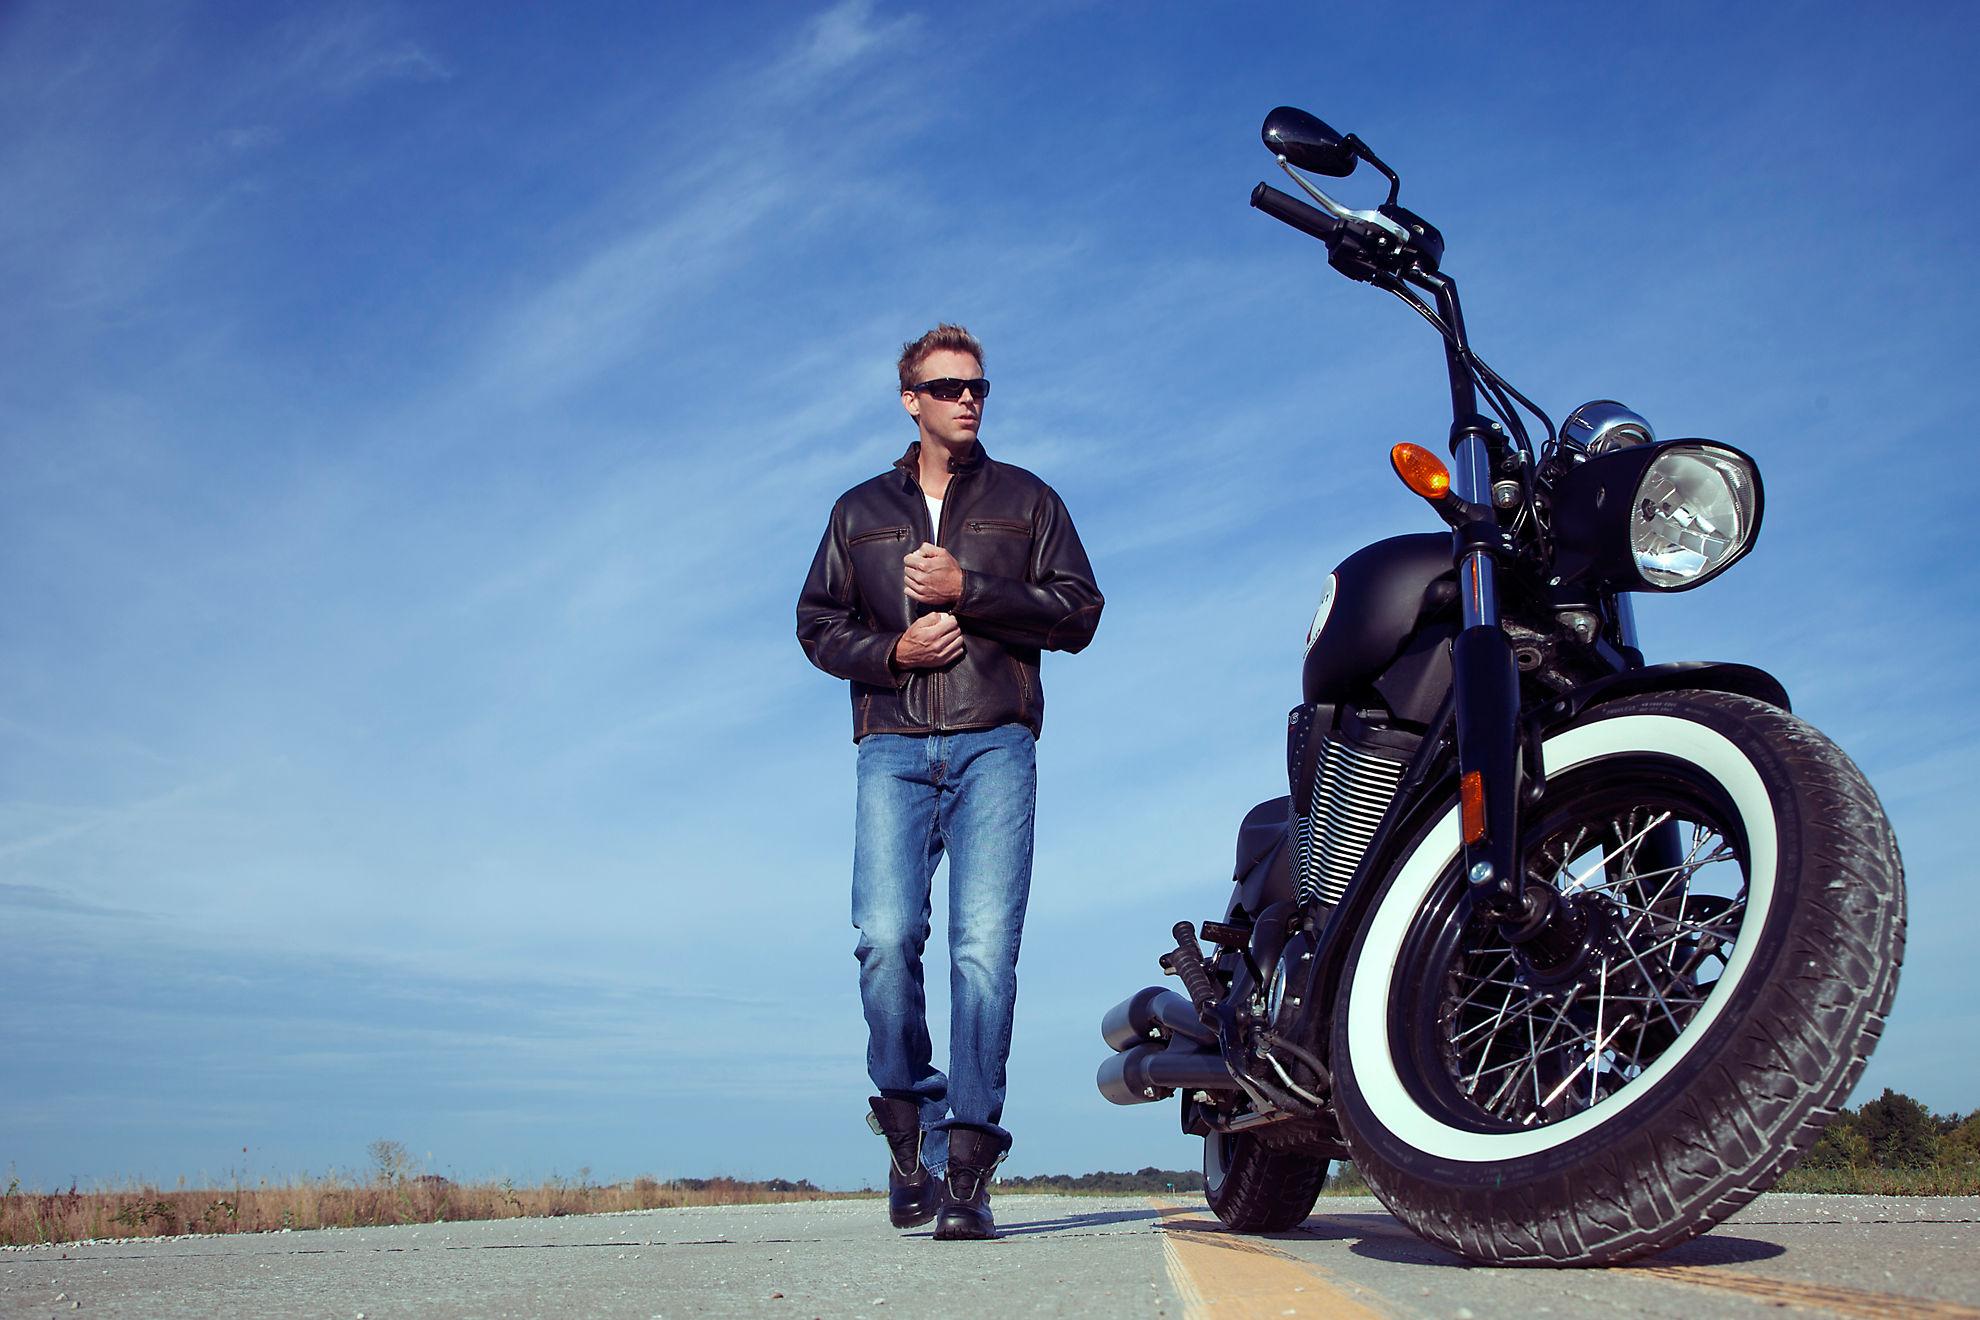 Jose Retro Cowhide Leather Motorcycle Jacket